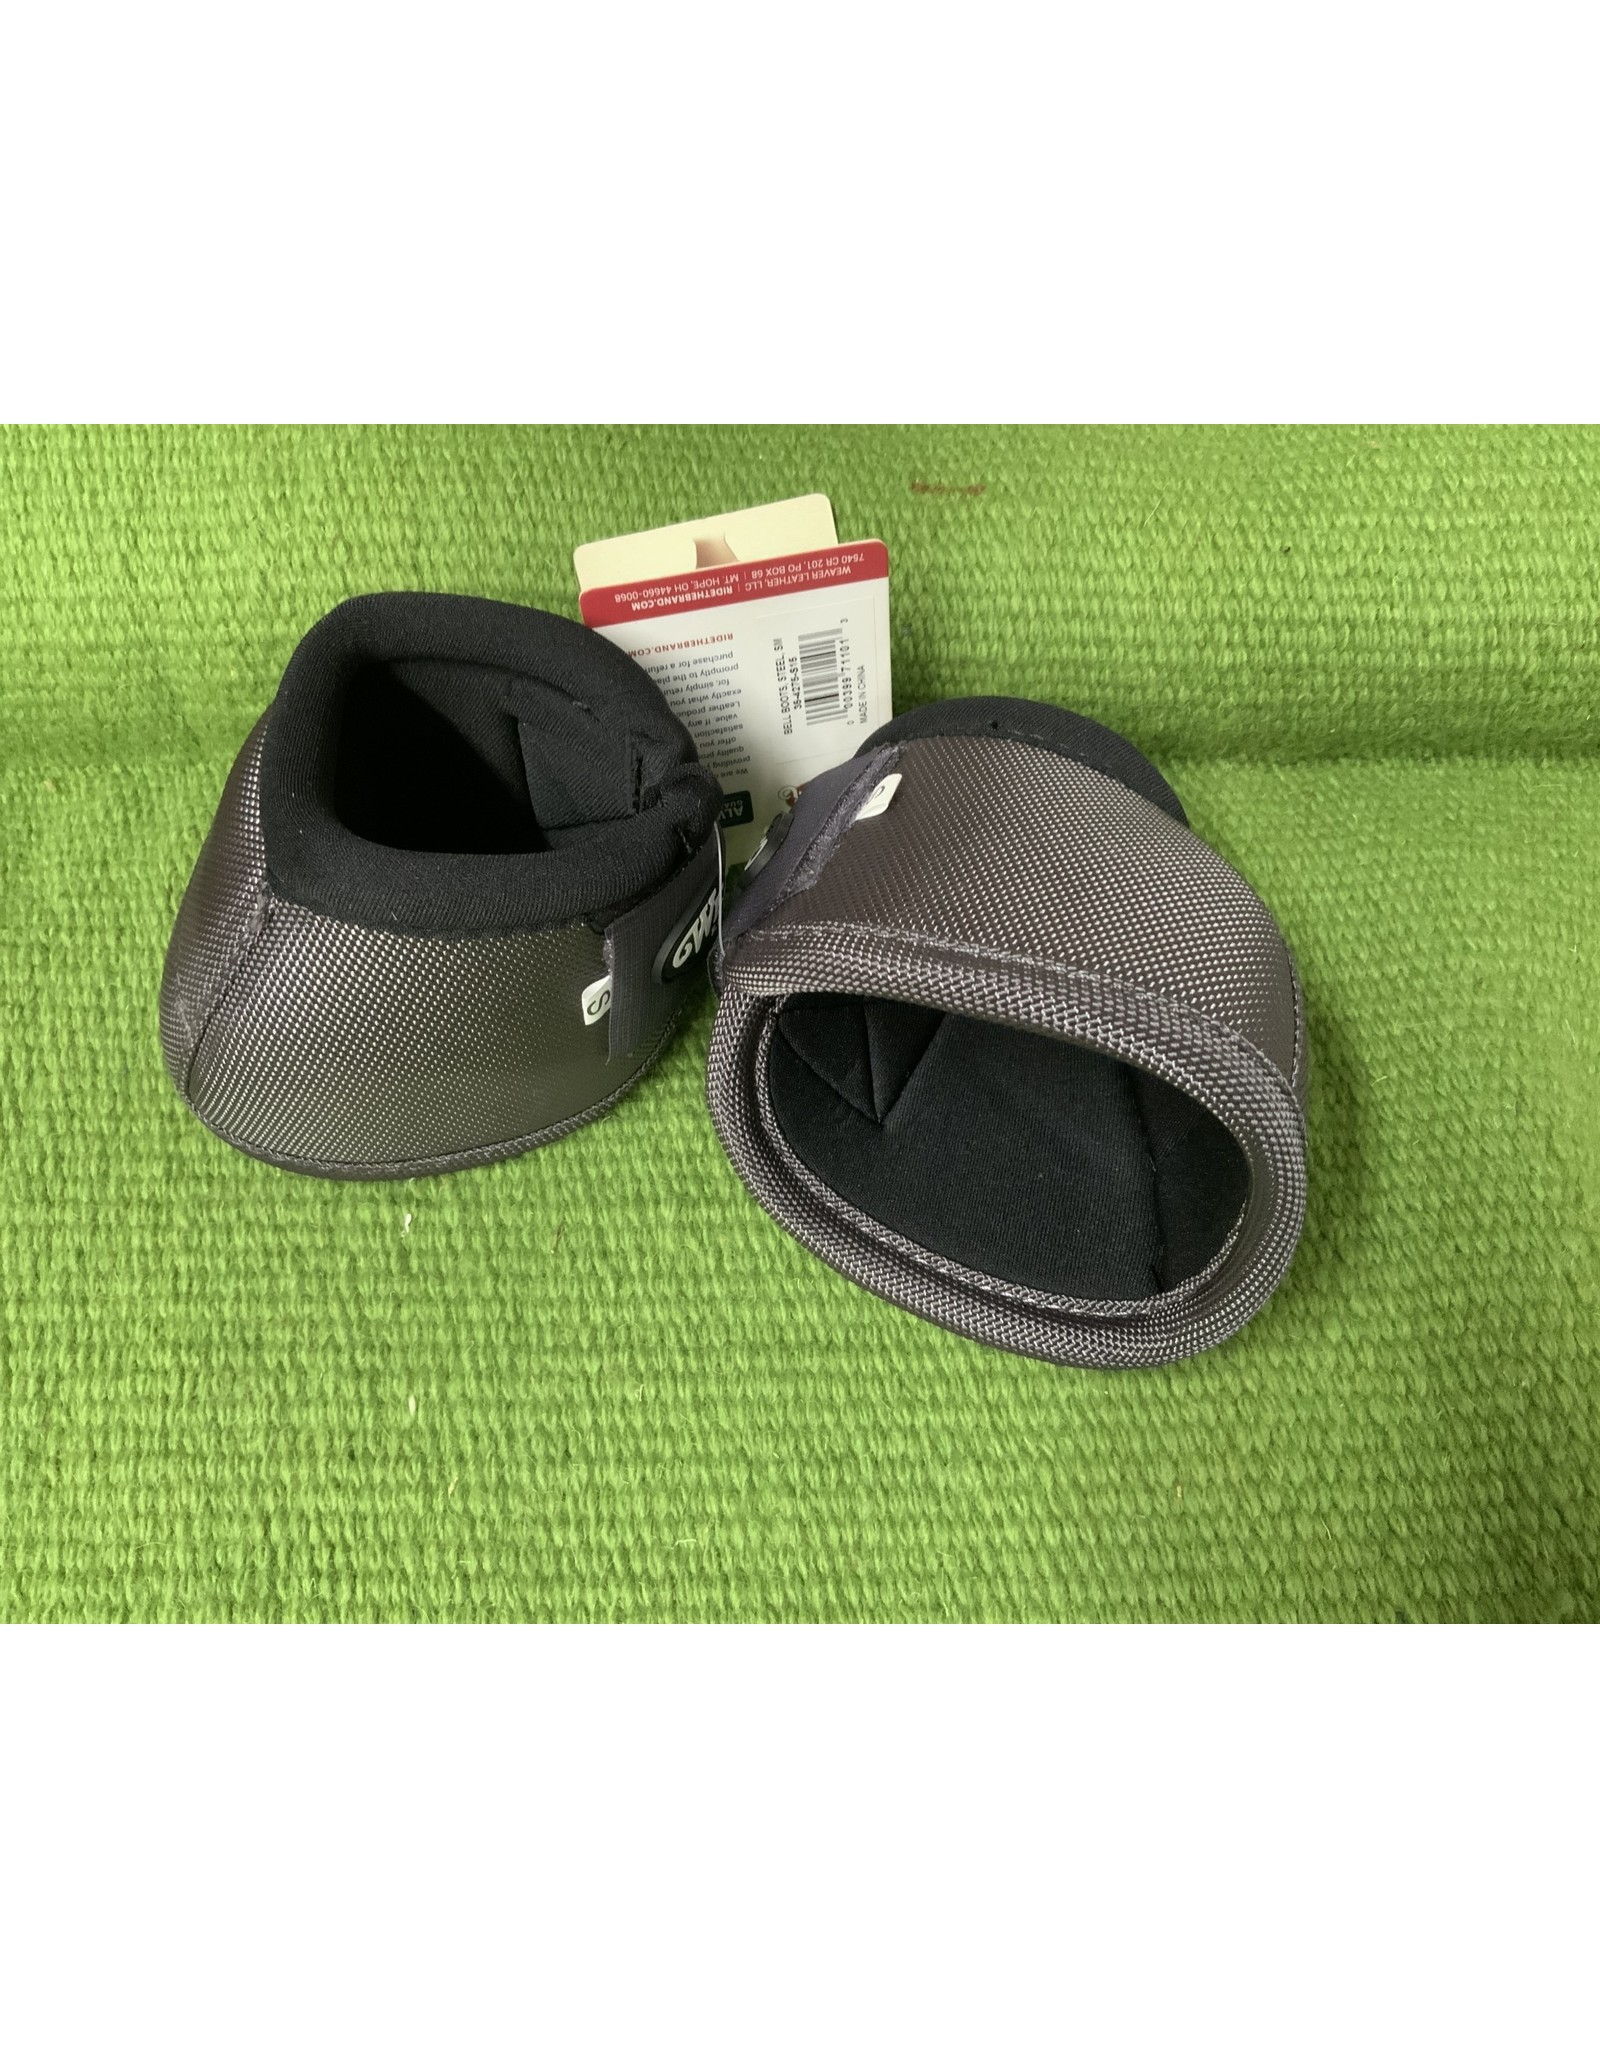 Bell Boot- Ballistic Nylon Bell Boots - Small - Steel - 35-4275-S15